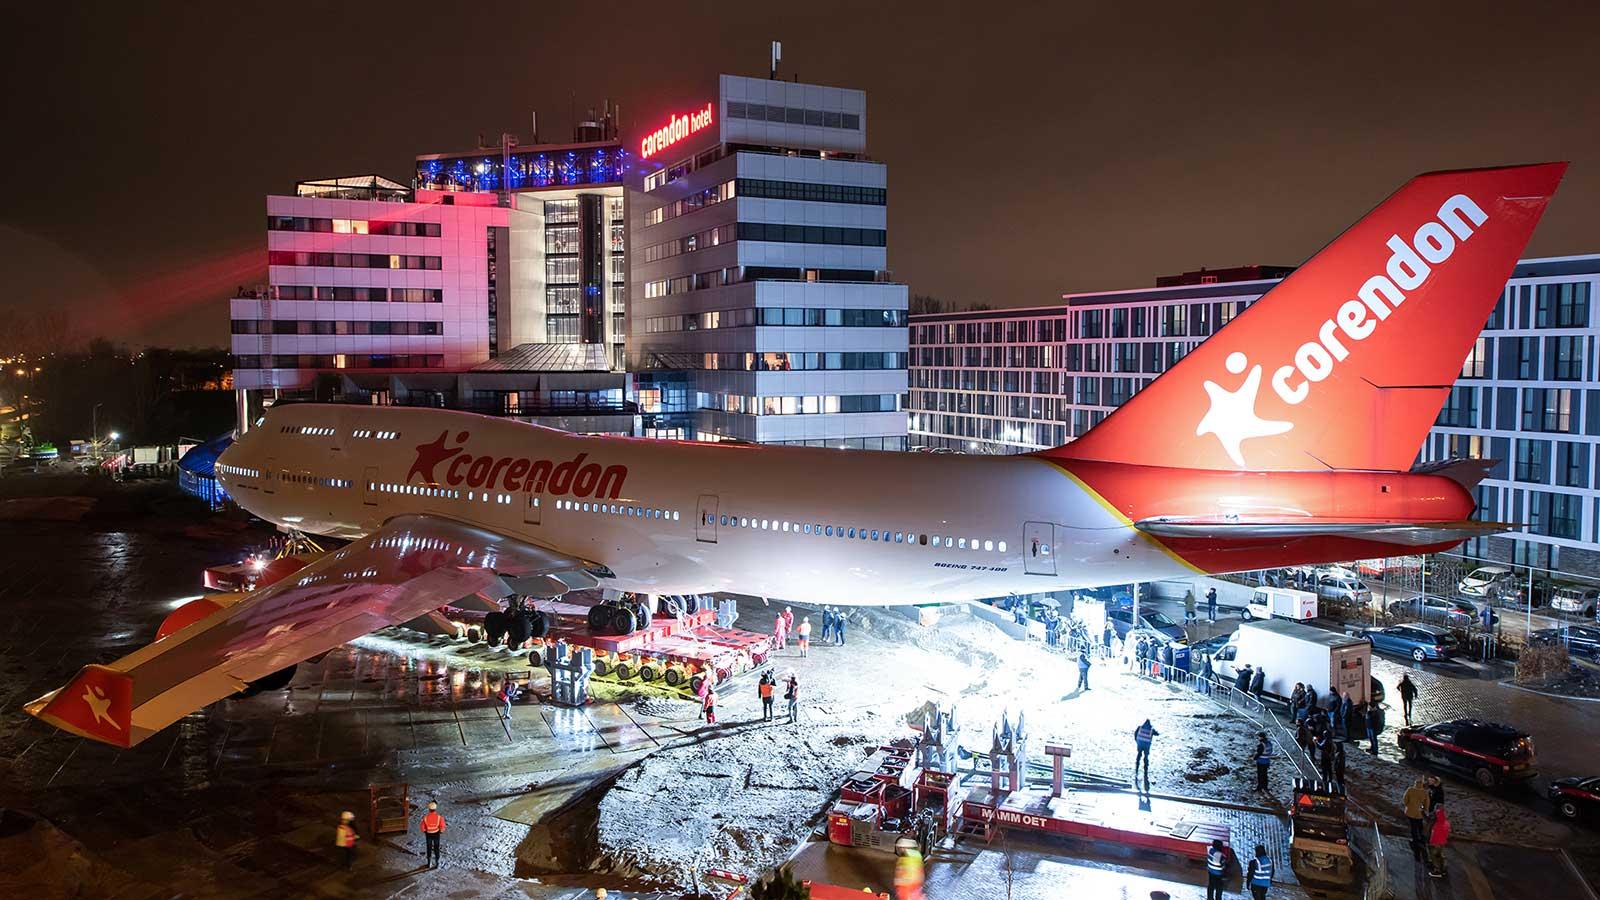 Corendon Hotel Boeing 747